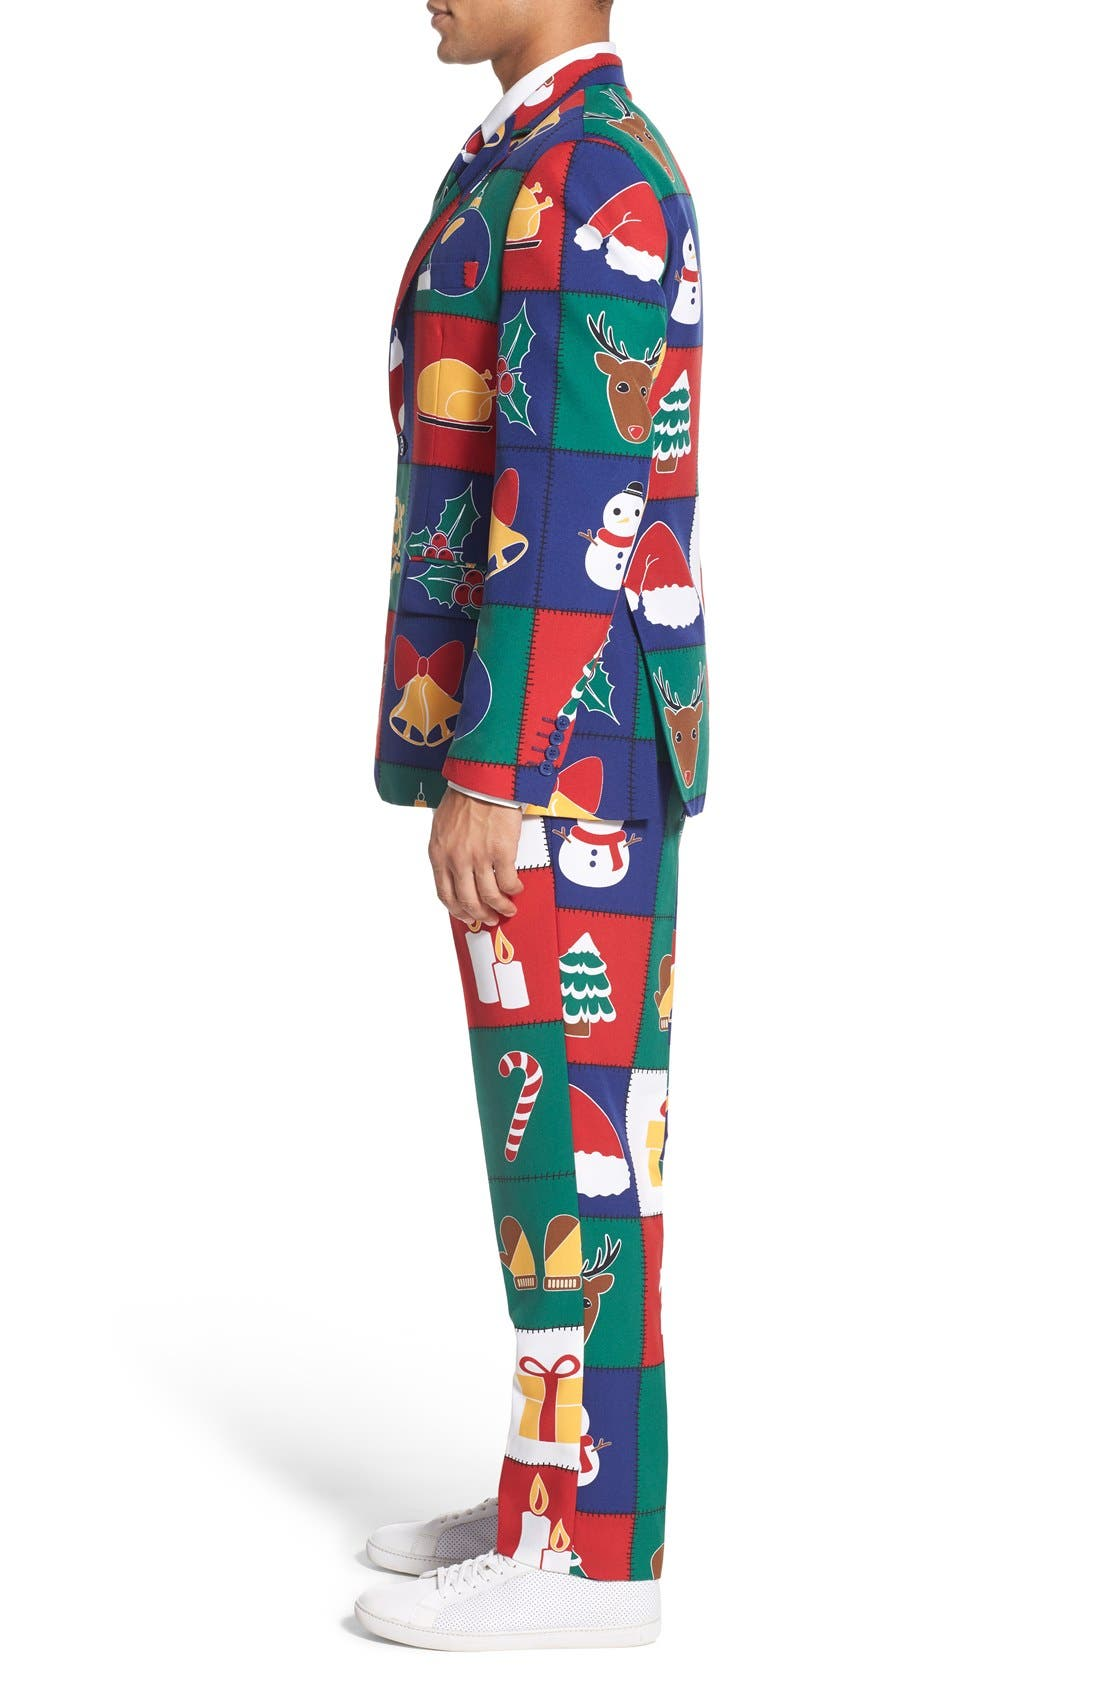 'Quilty Pleasure' Holiday Suit & Tie,                             Alternate thumbnail 5, color,                             300